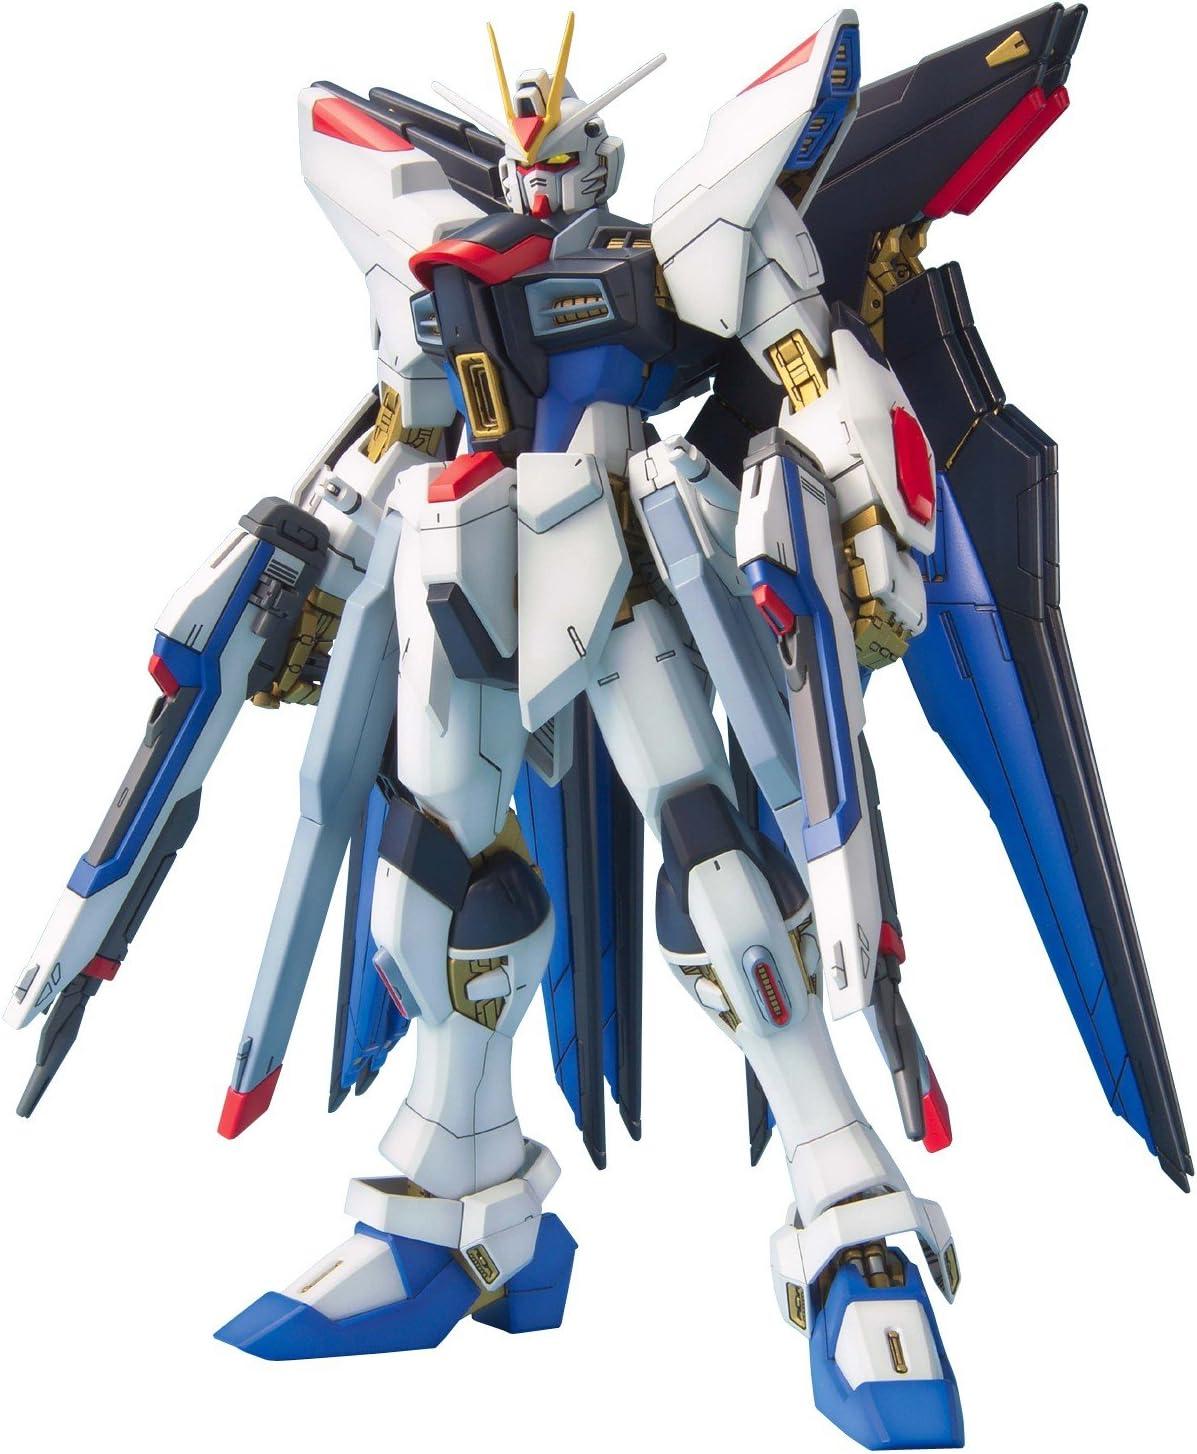 15+ Mg Strike Freedom Gundam Image Download 6